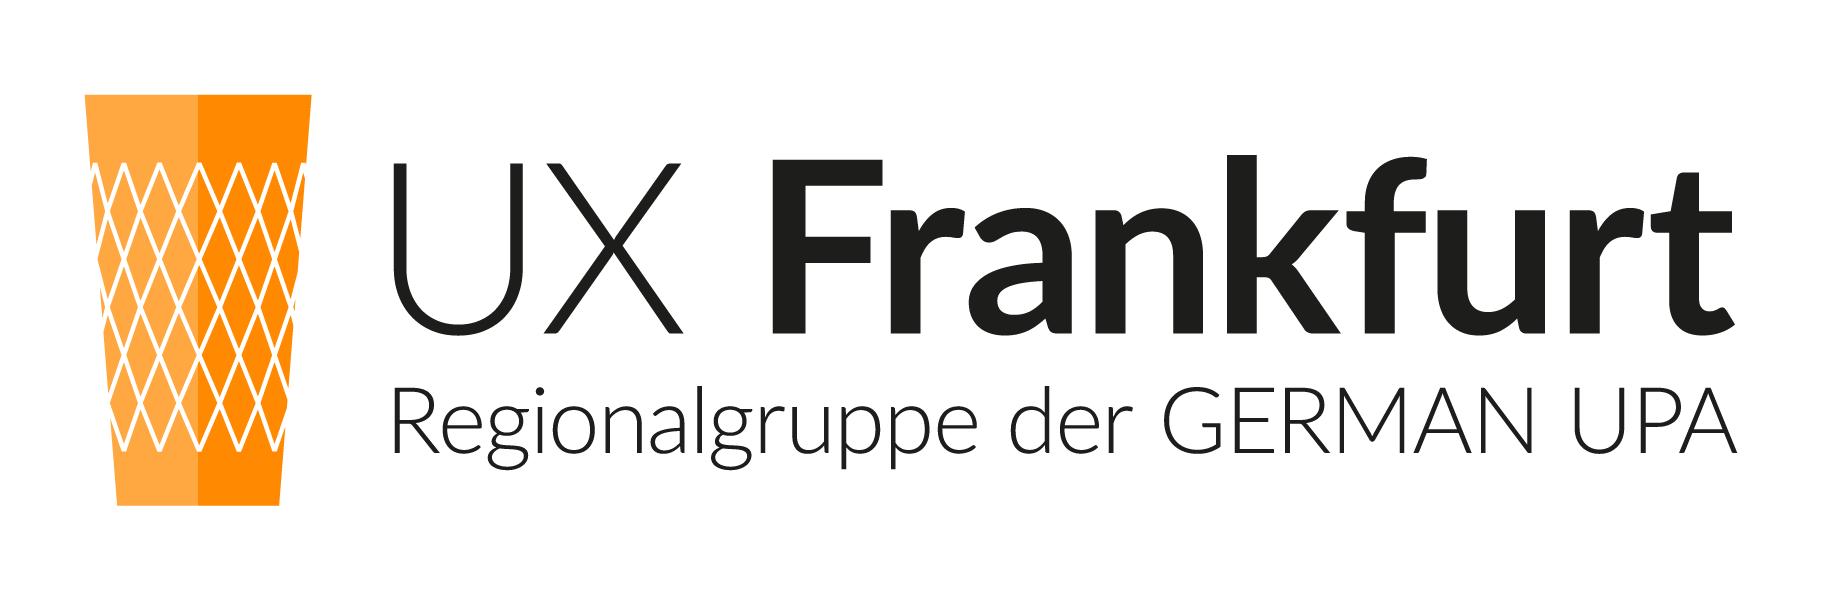 Logo UX Frankfurt Regionalgruppe der German UPA